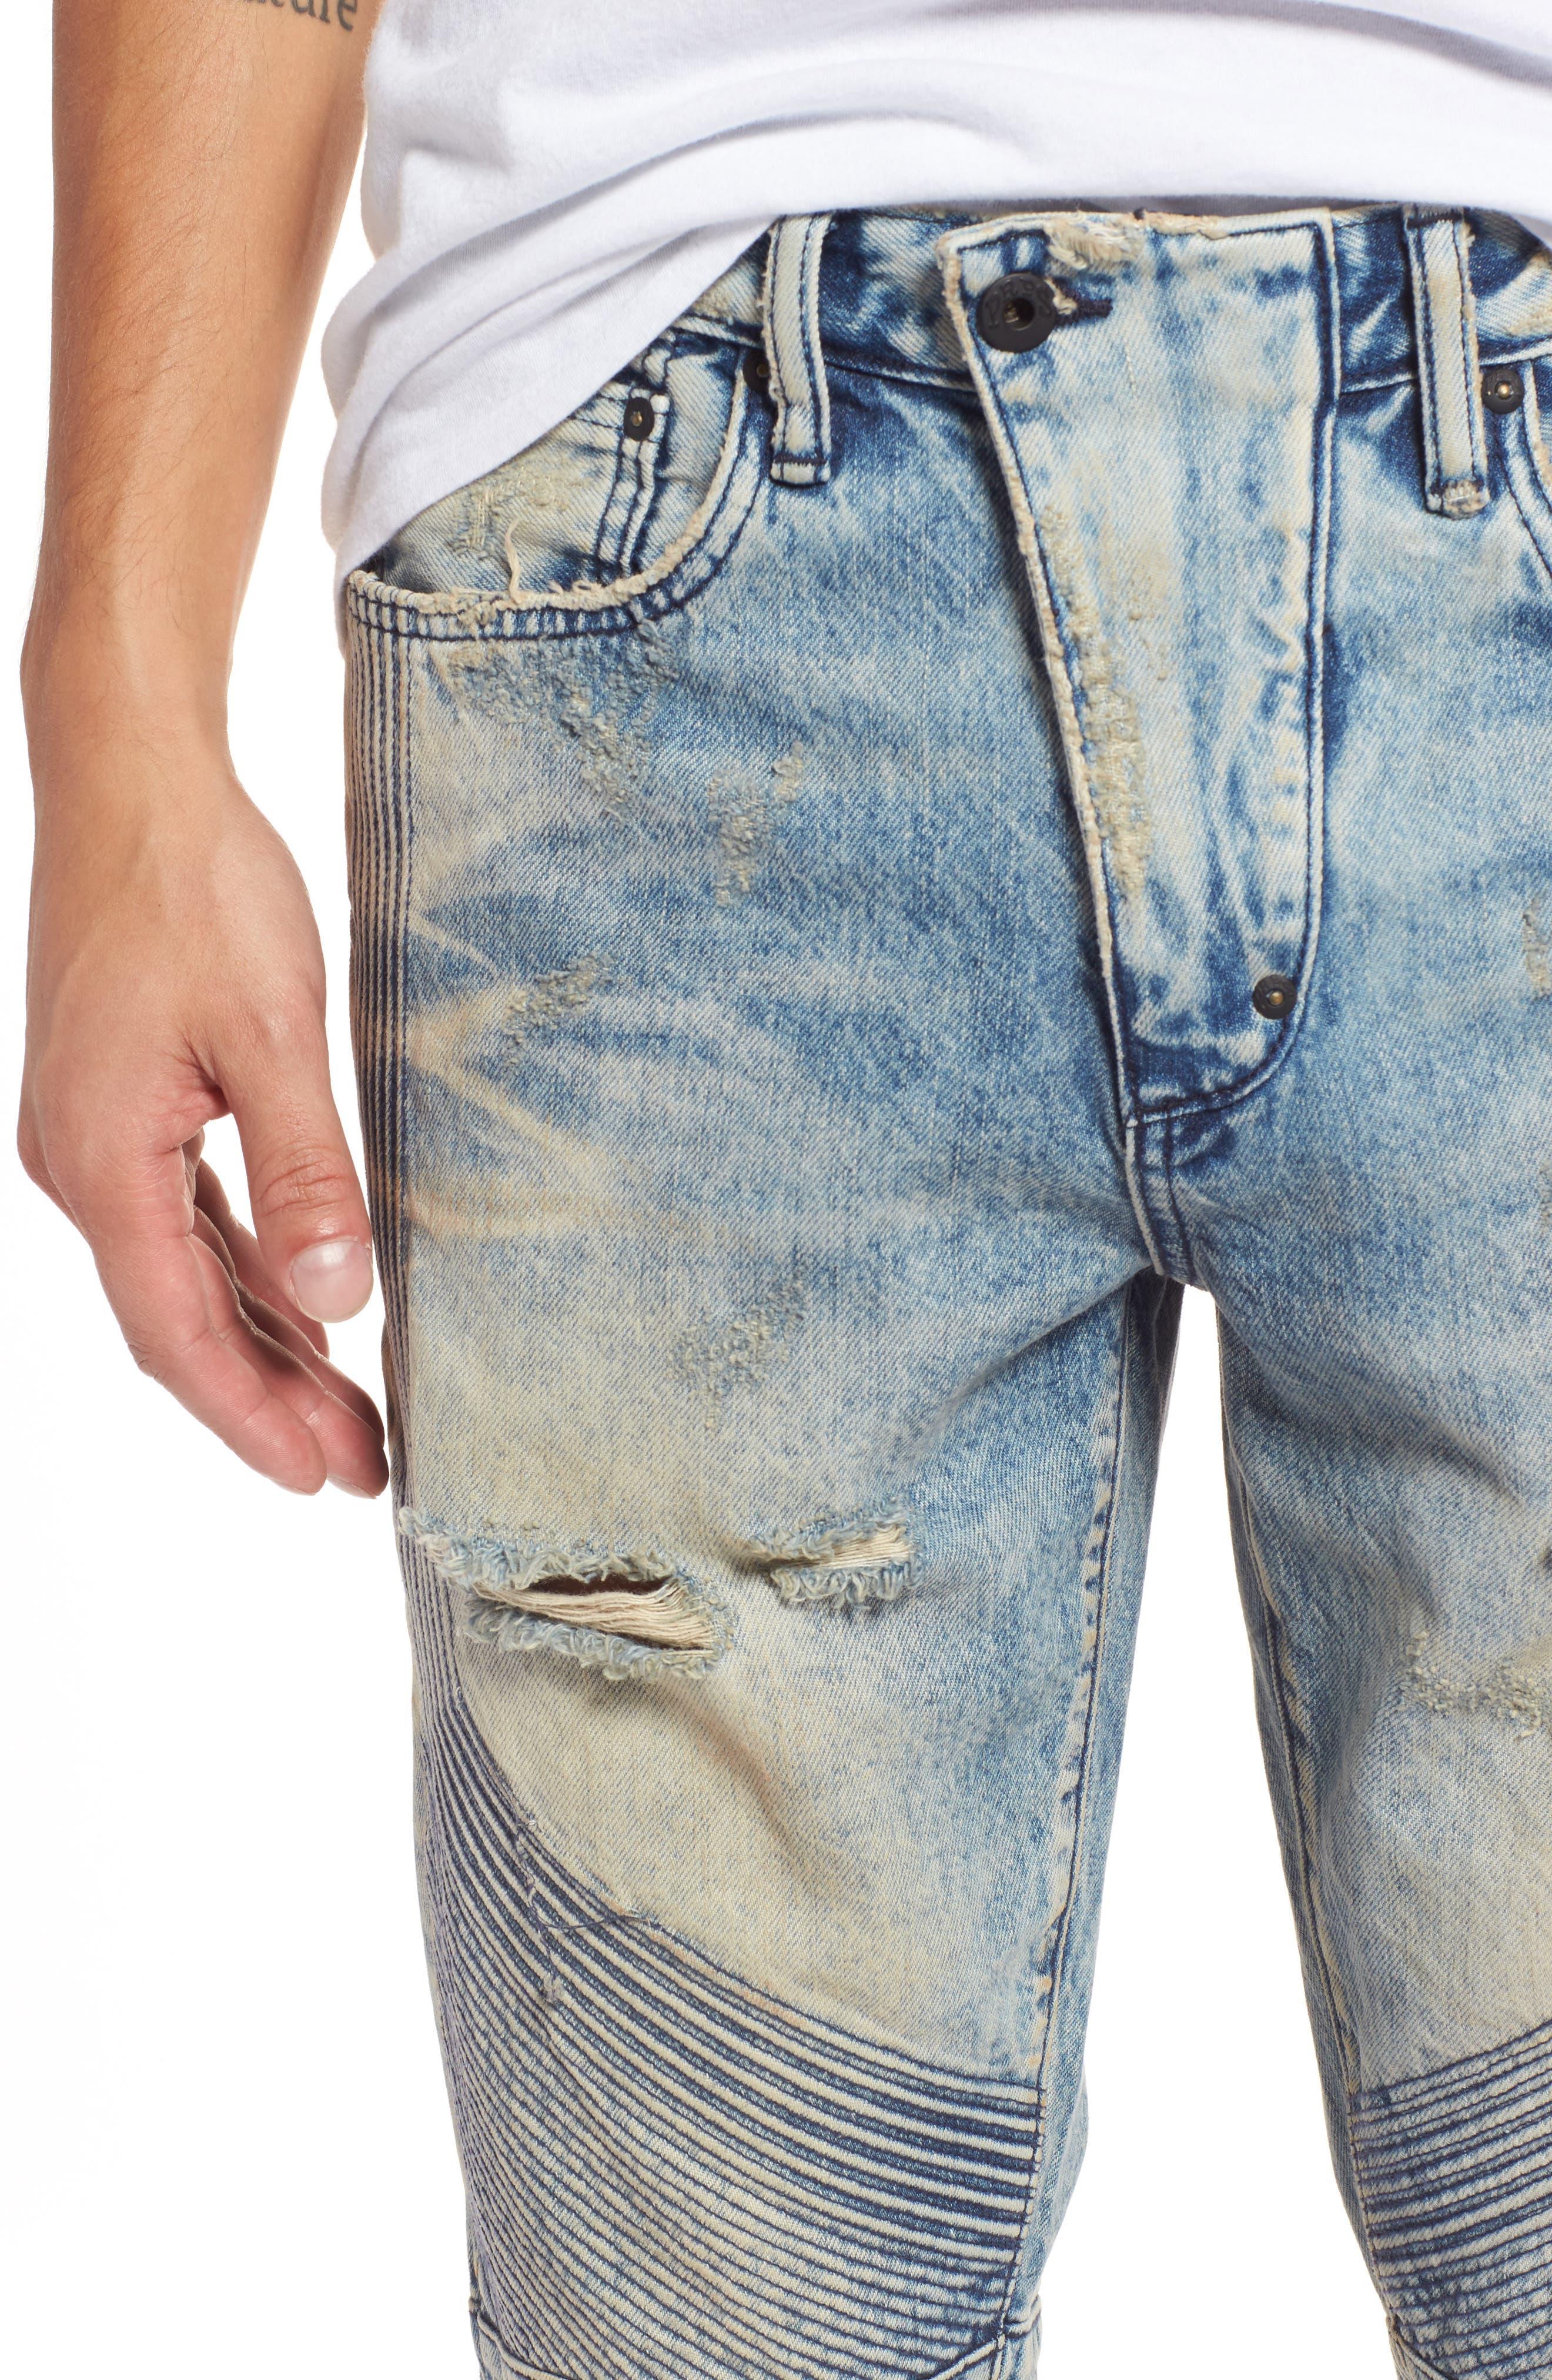 Le Sabre Slim Fit Moto Jeans,                             Alternate thumbnail 4, color,                             Harvested Light Wash